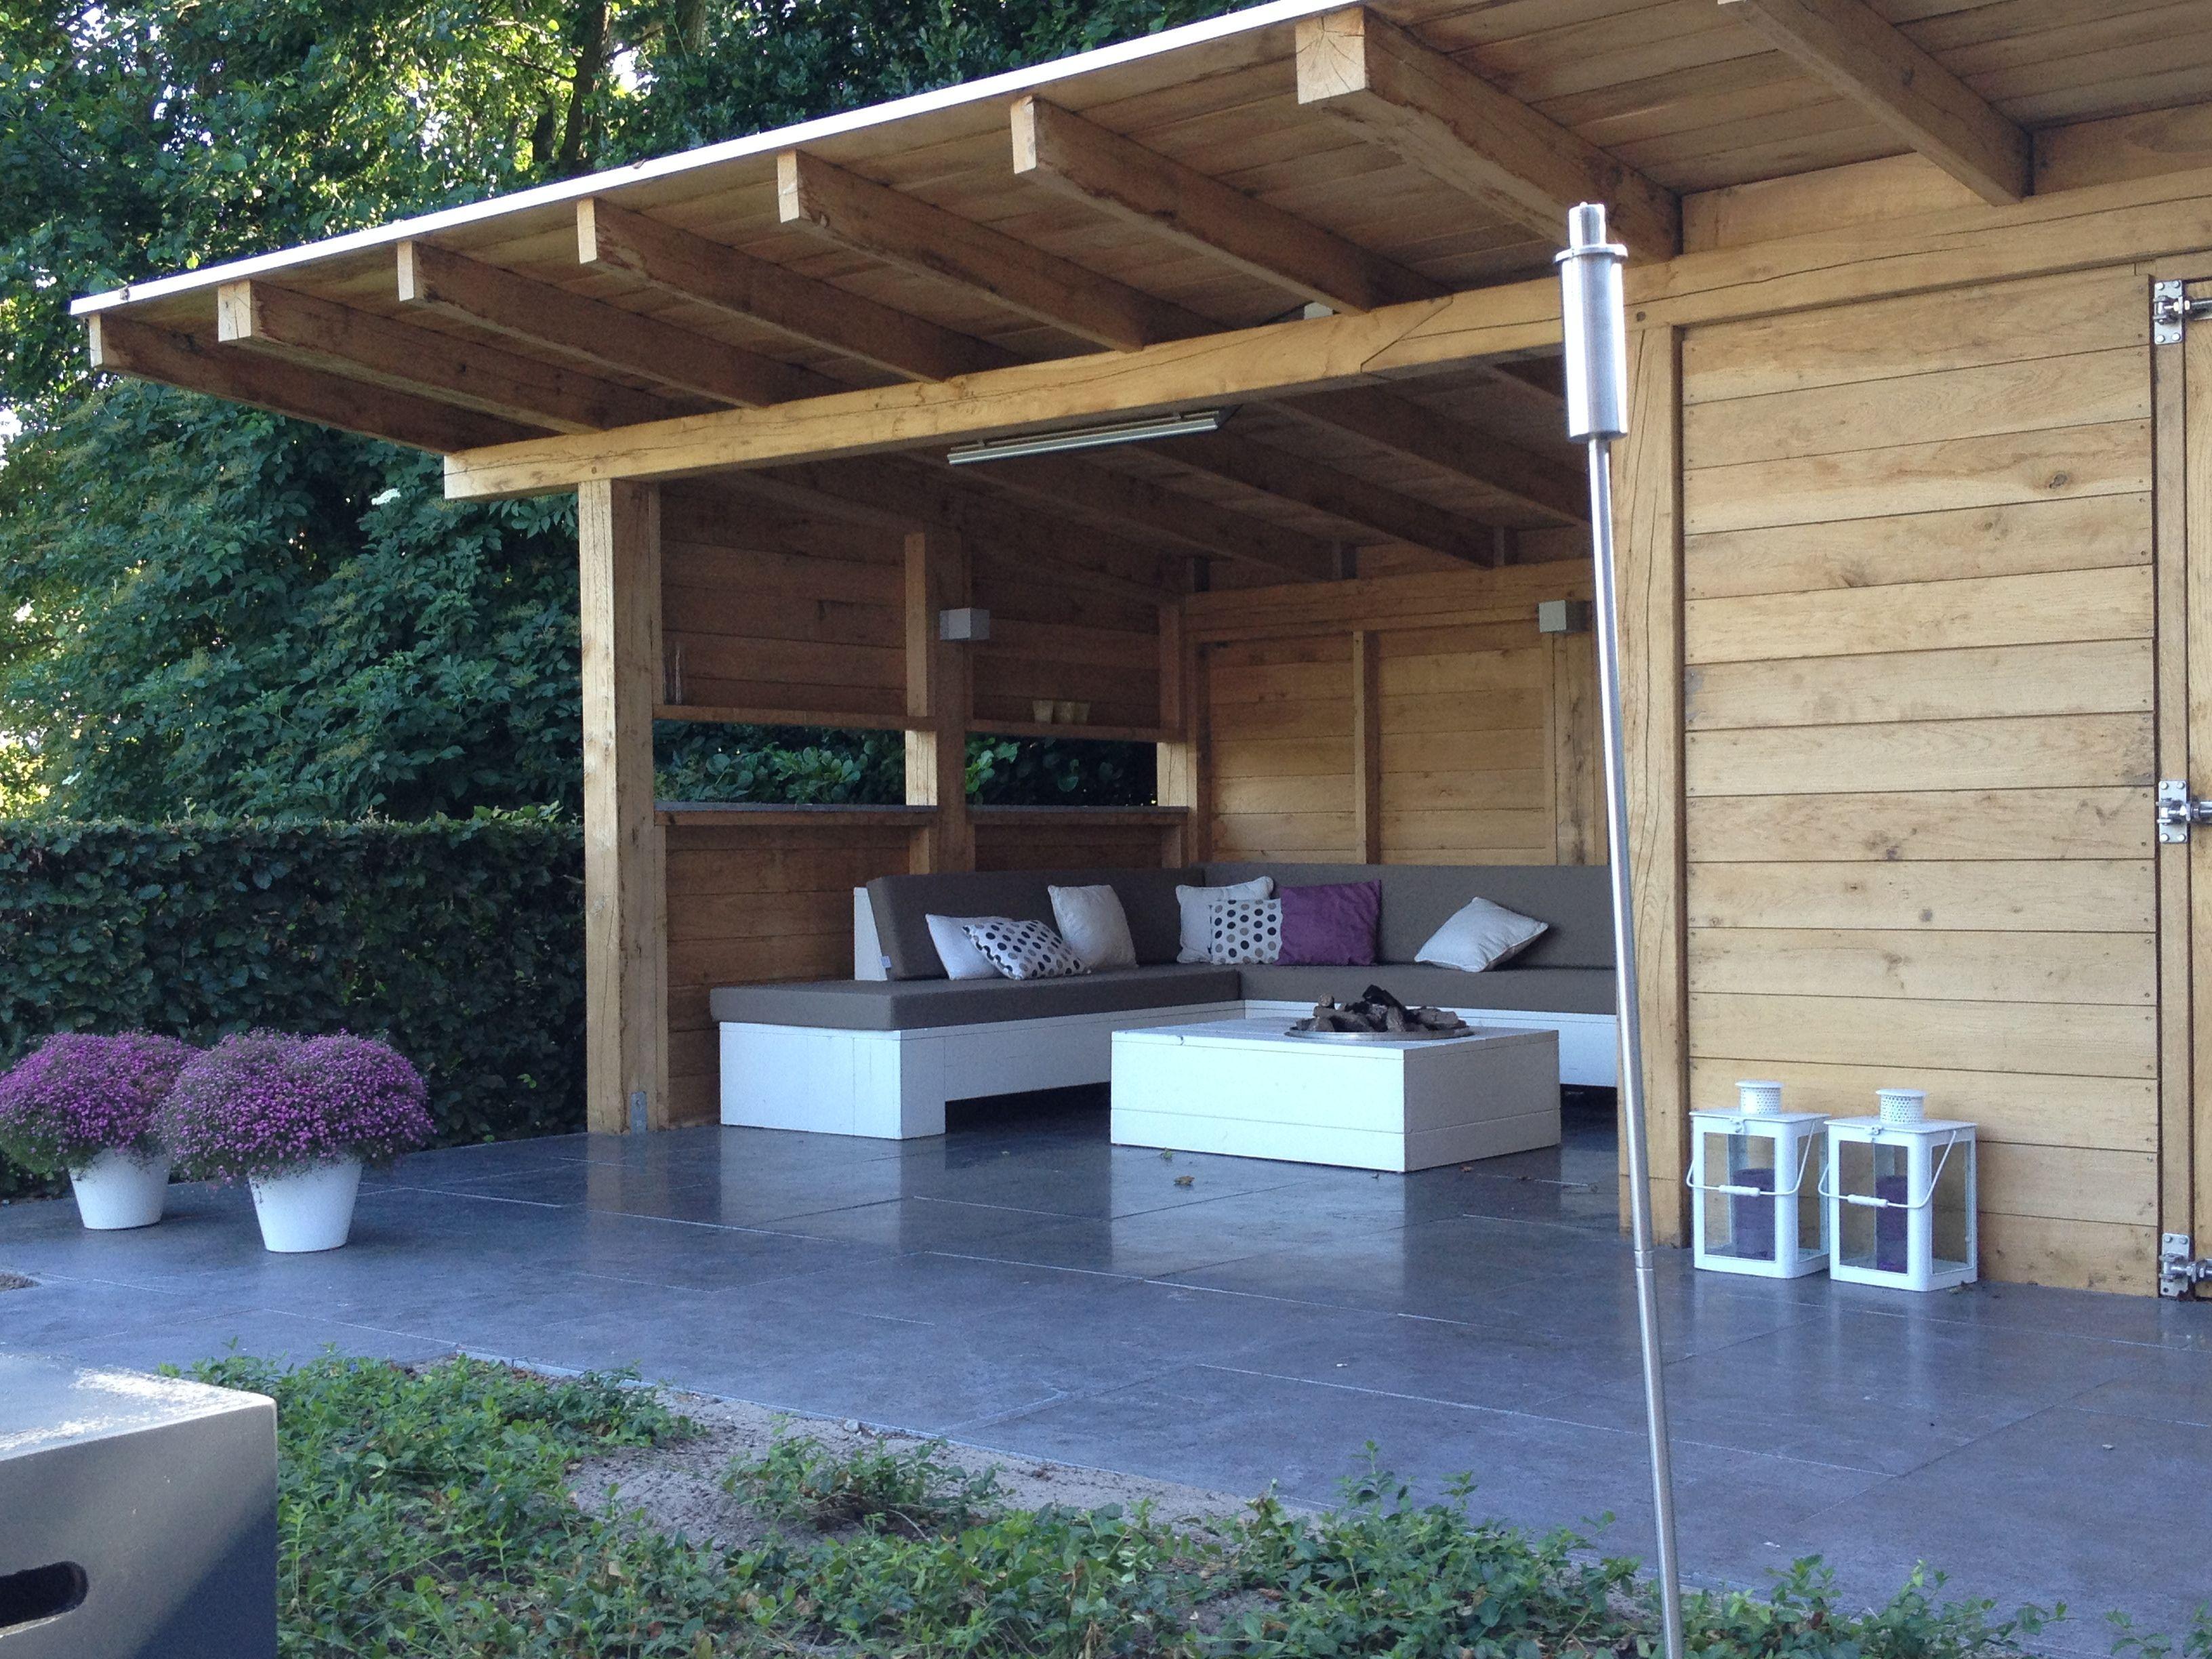 gardenhouse with fireplace my home pinterest verandas